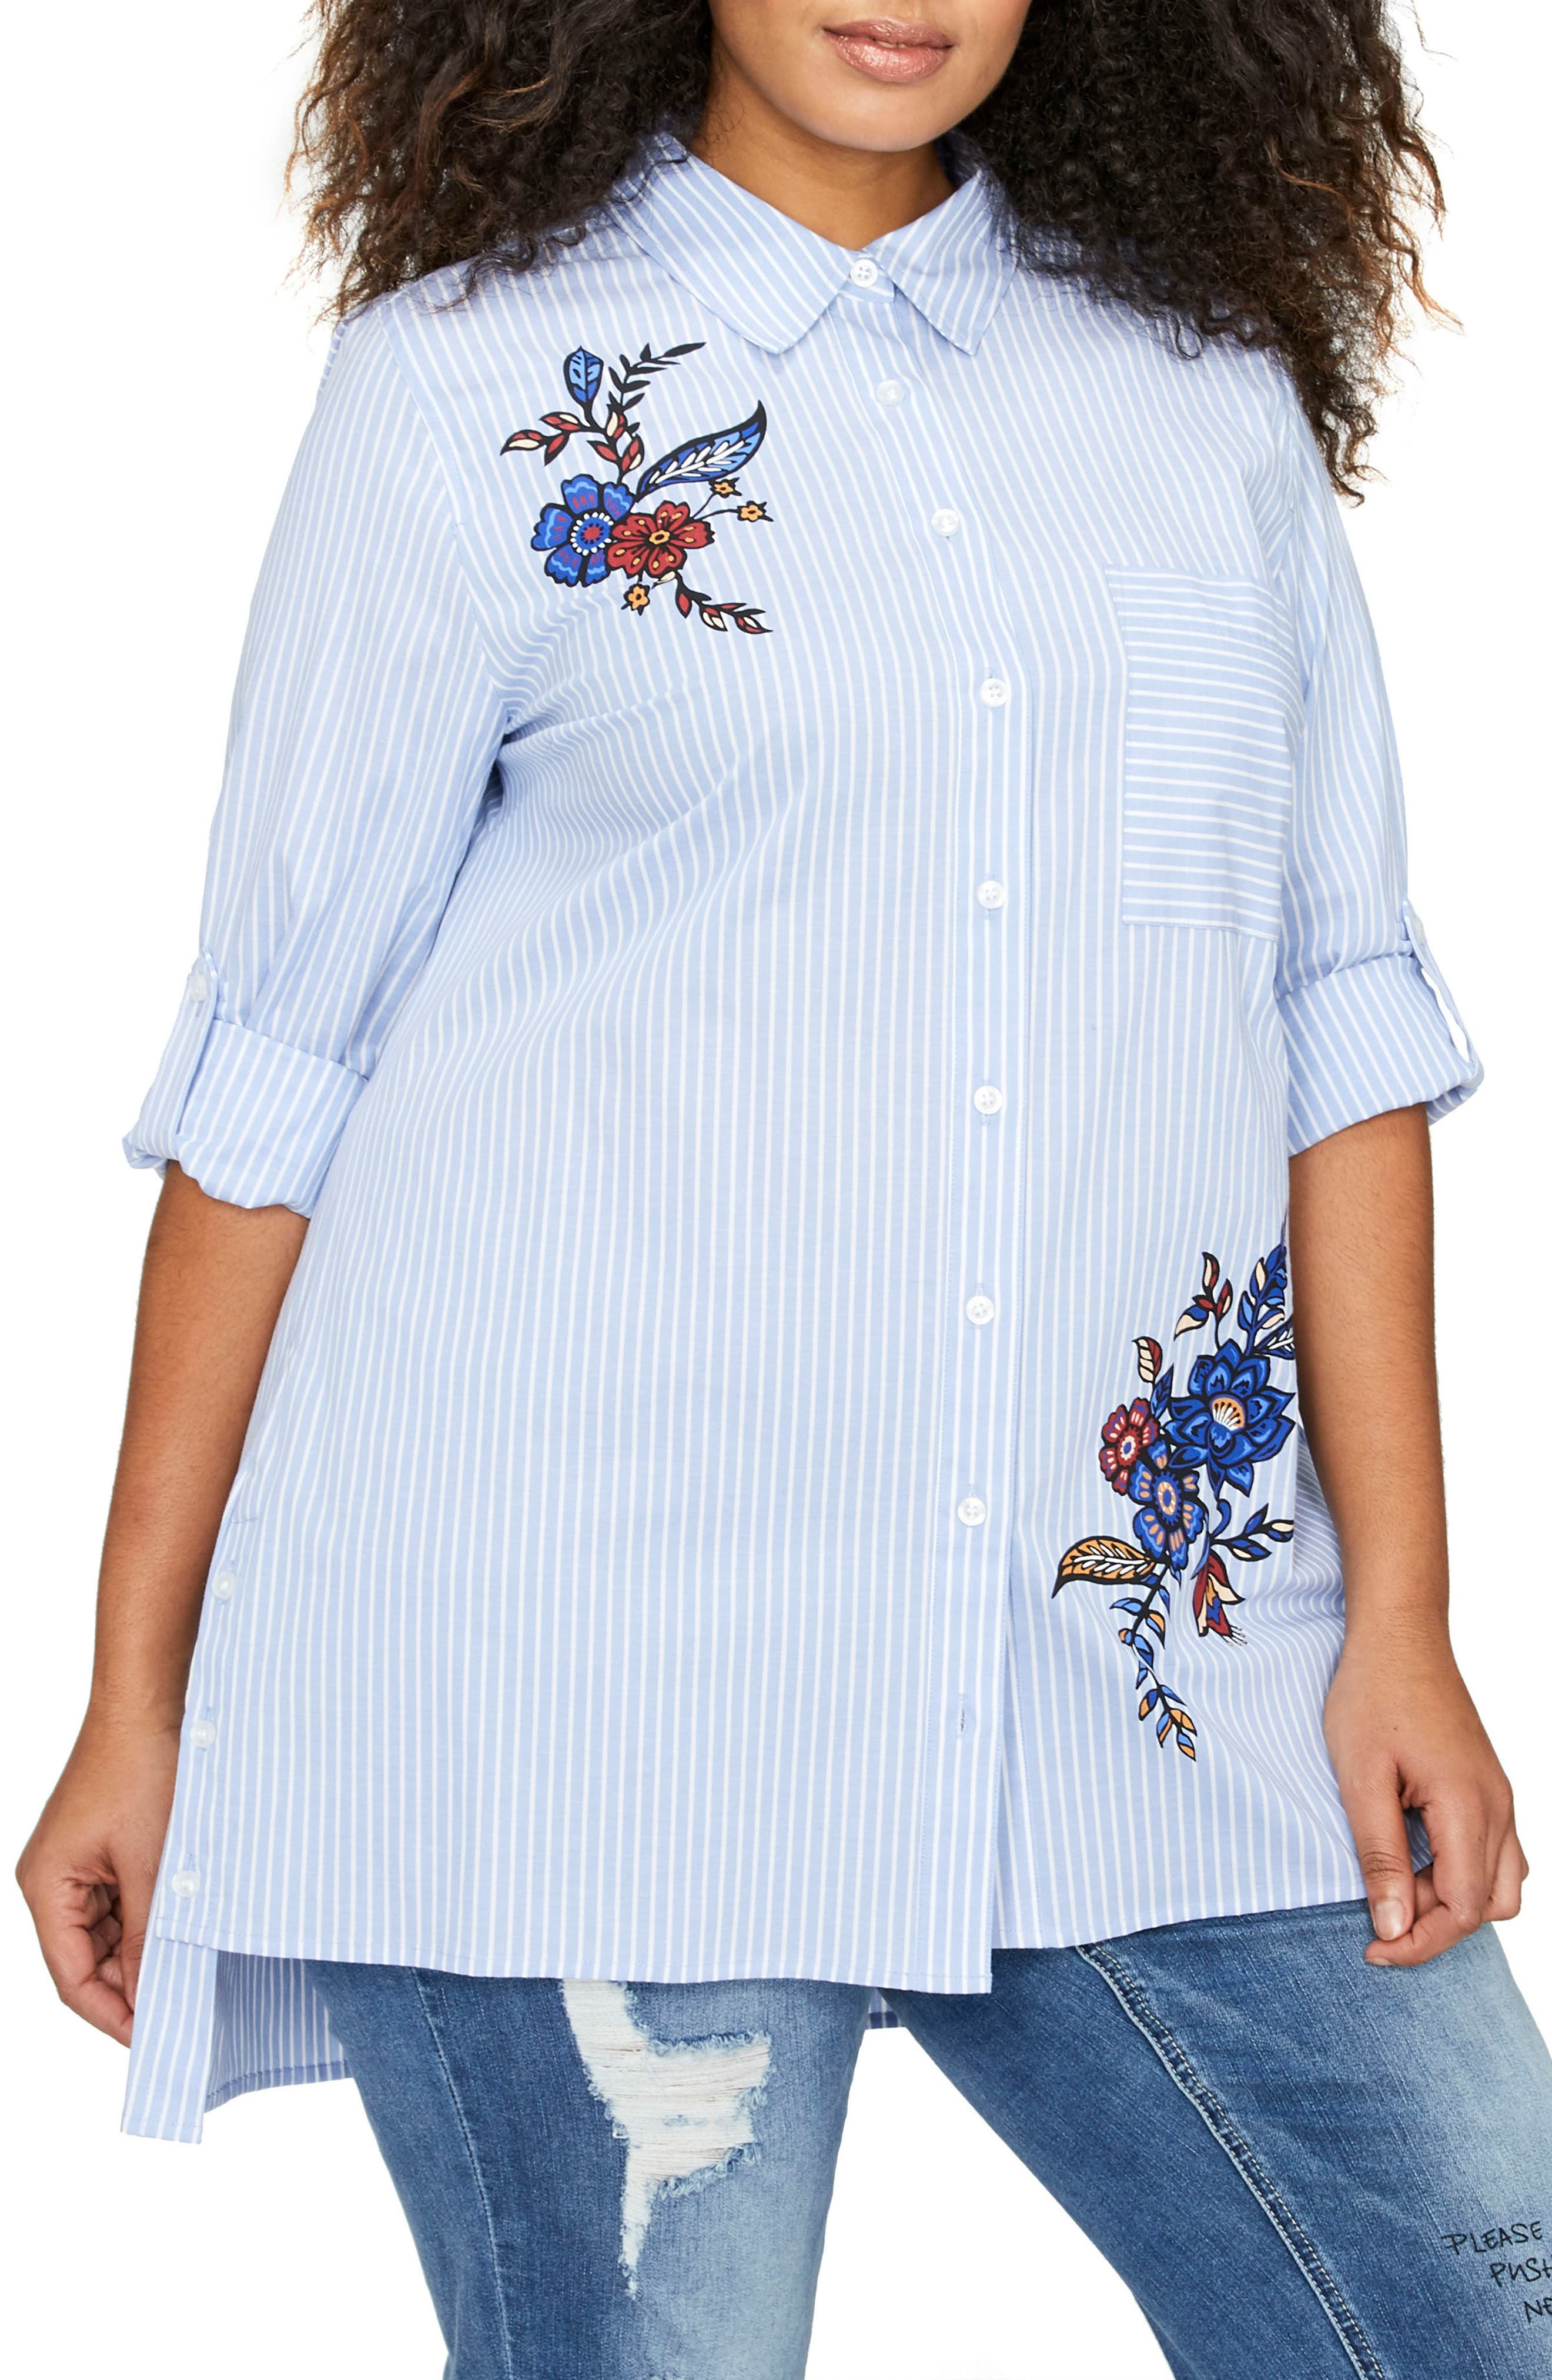 ADDITION ELLE LOVE AND LEGEND Flower & Stripe Shirt (Plus Size)